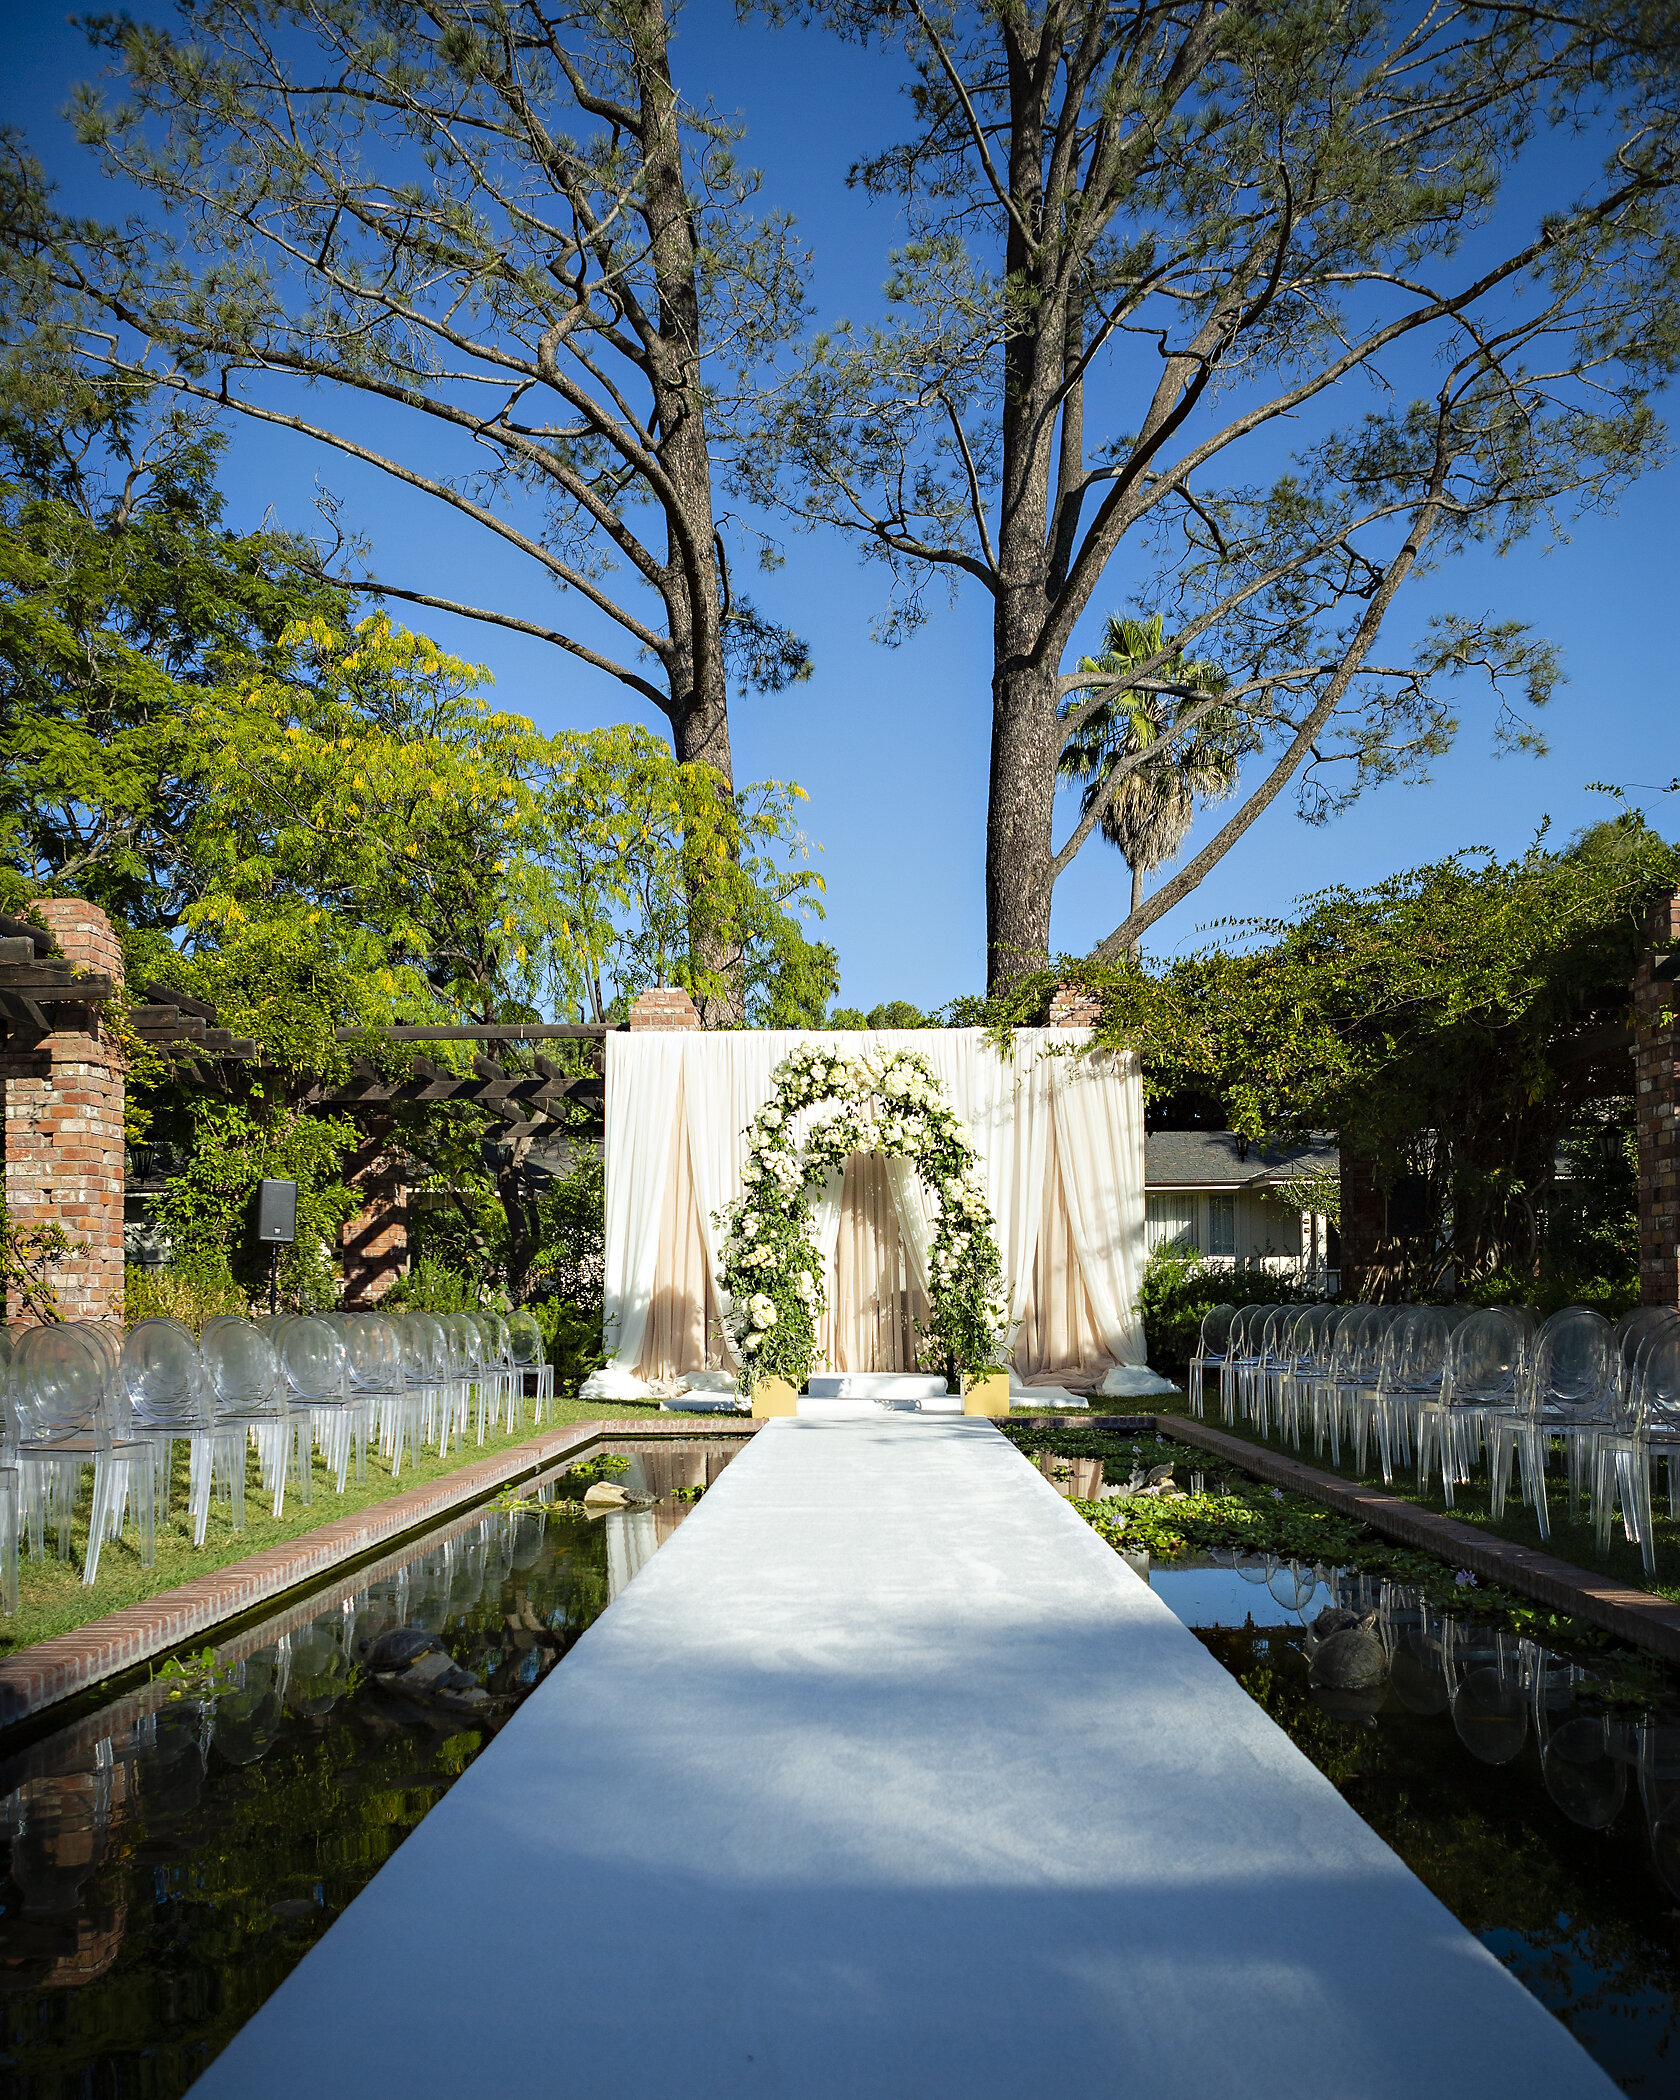 alegria-by-design-wedding-planner-planning-event-design-coordinator-day-of-belmond-el-encanto-lily-pond-garden-ceremony-formal-black-tie (3).jpg